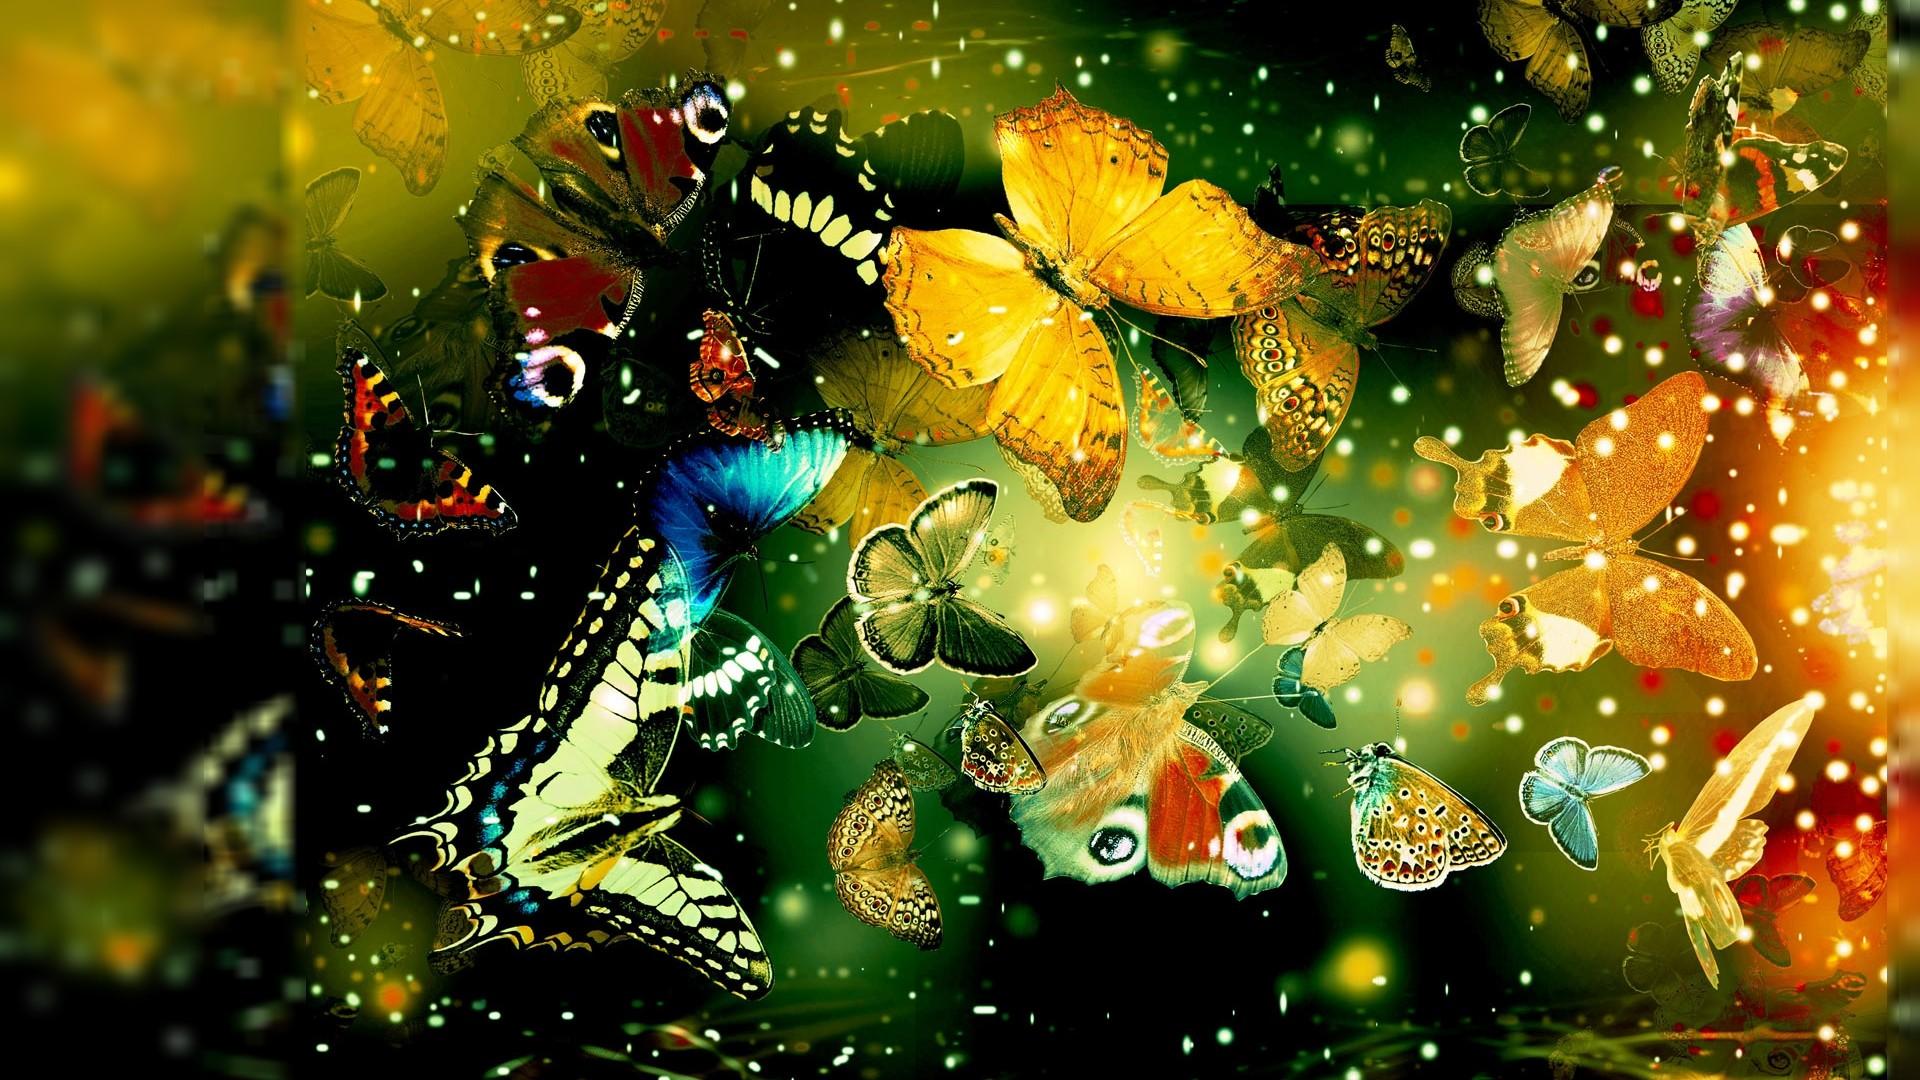 Cool Wallpapers Butterfly Designs HD Wallpaper HD 1920x1080